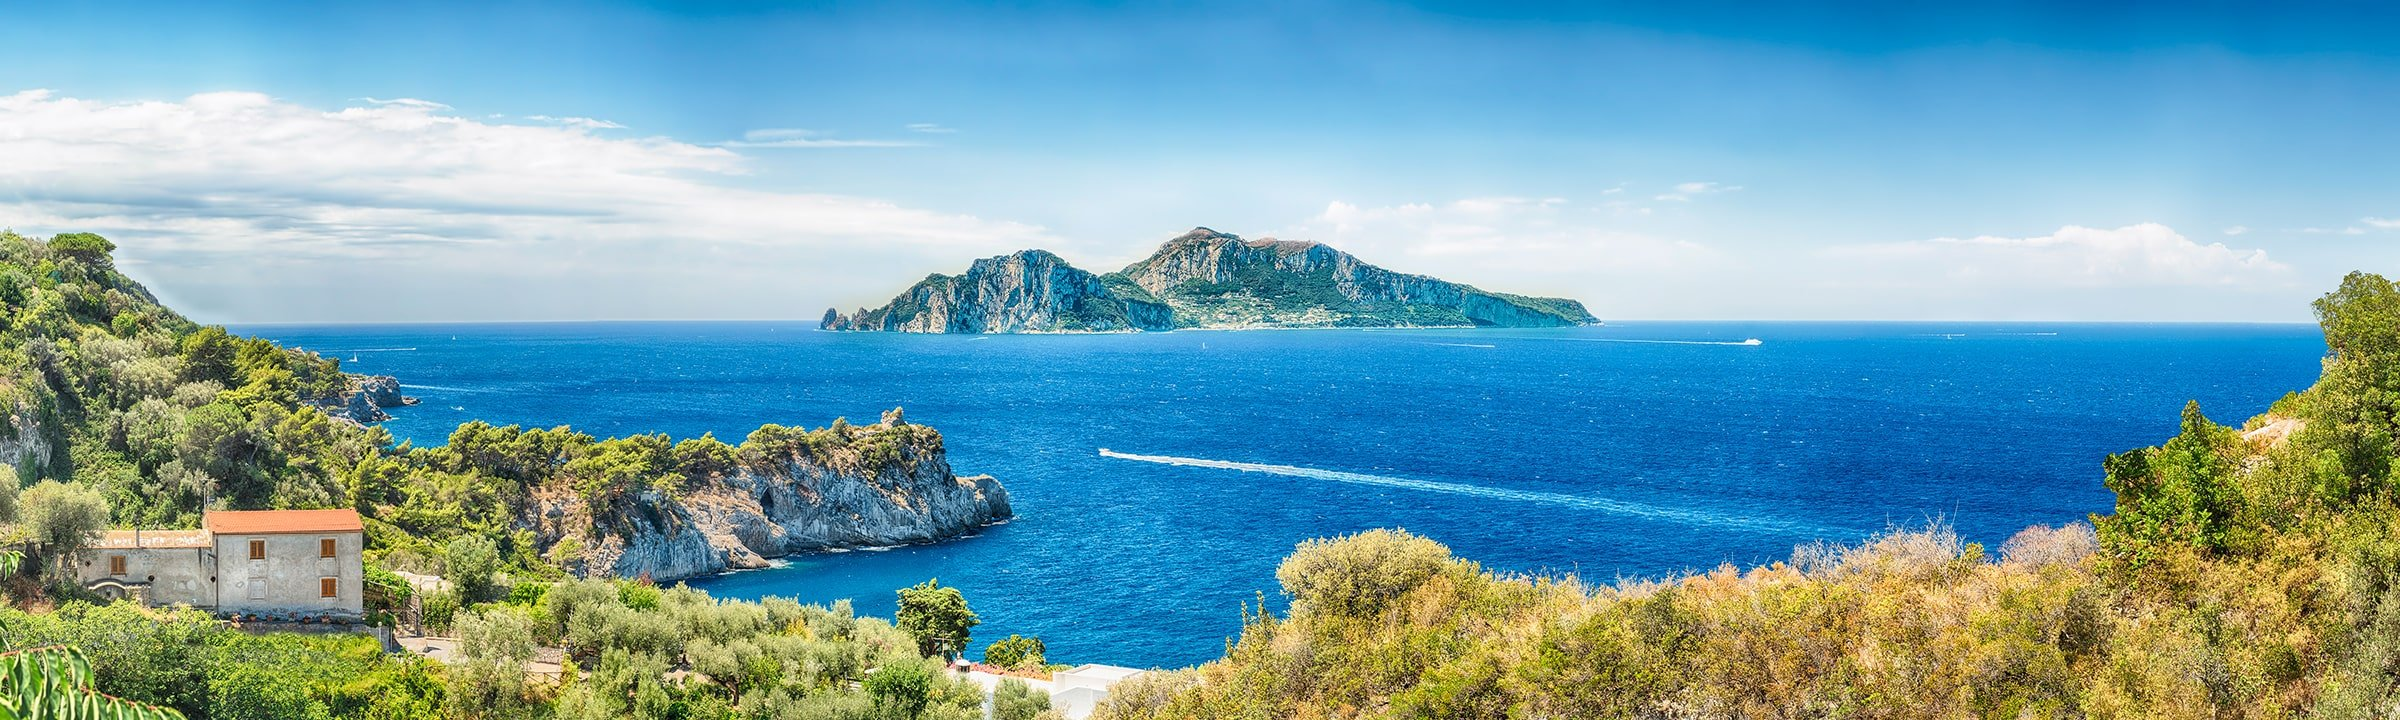 Sorrento Coast and Capri